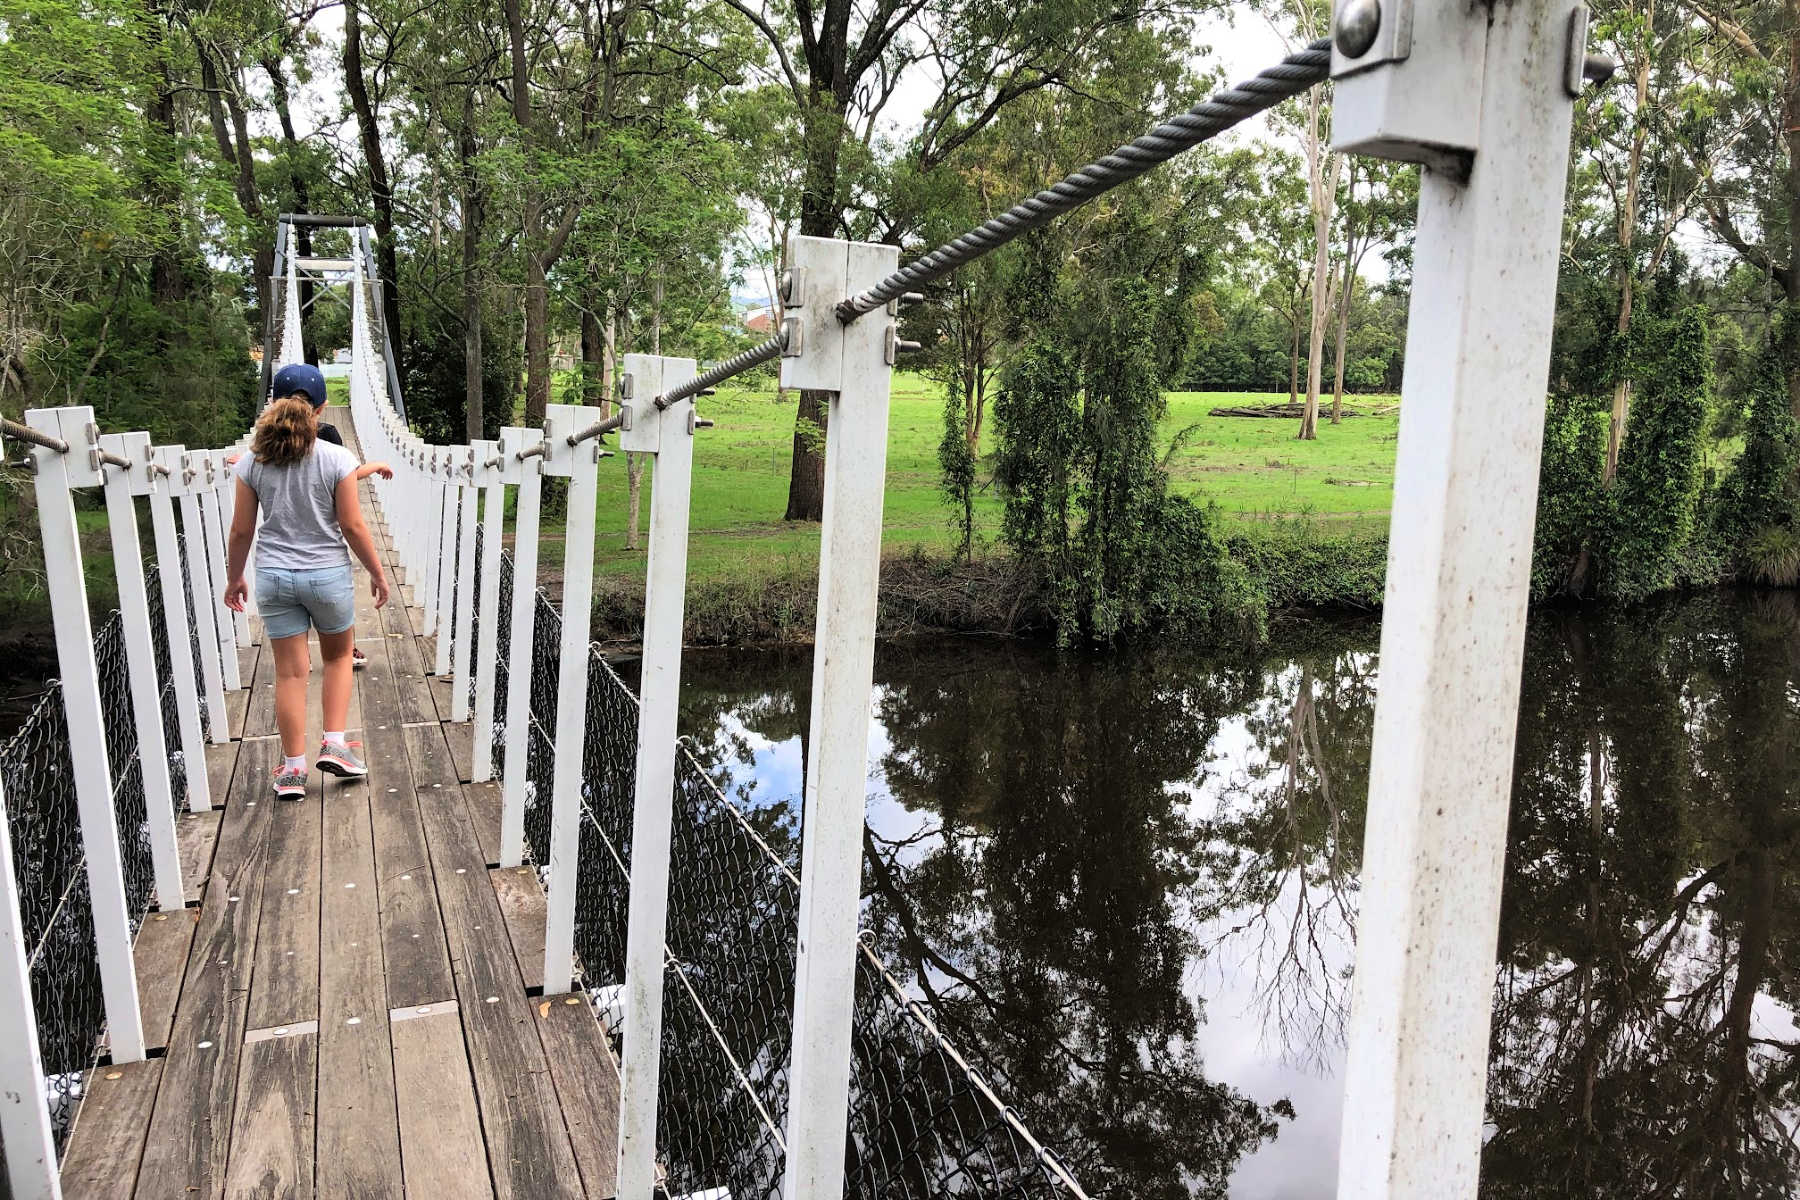 cooranbong-swing-bridge-cooranbong-main